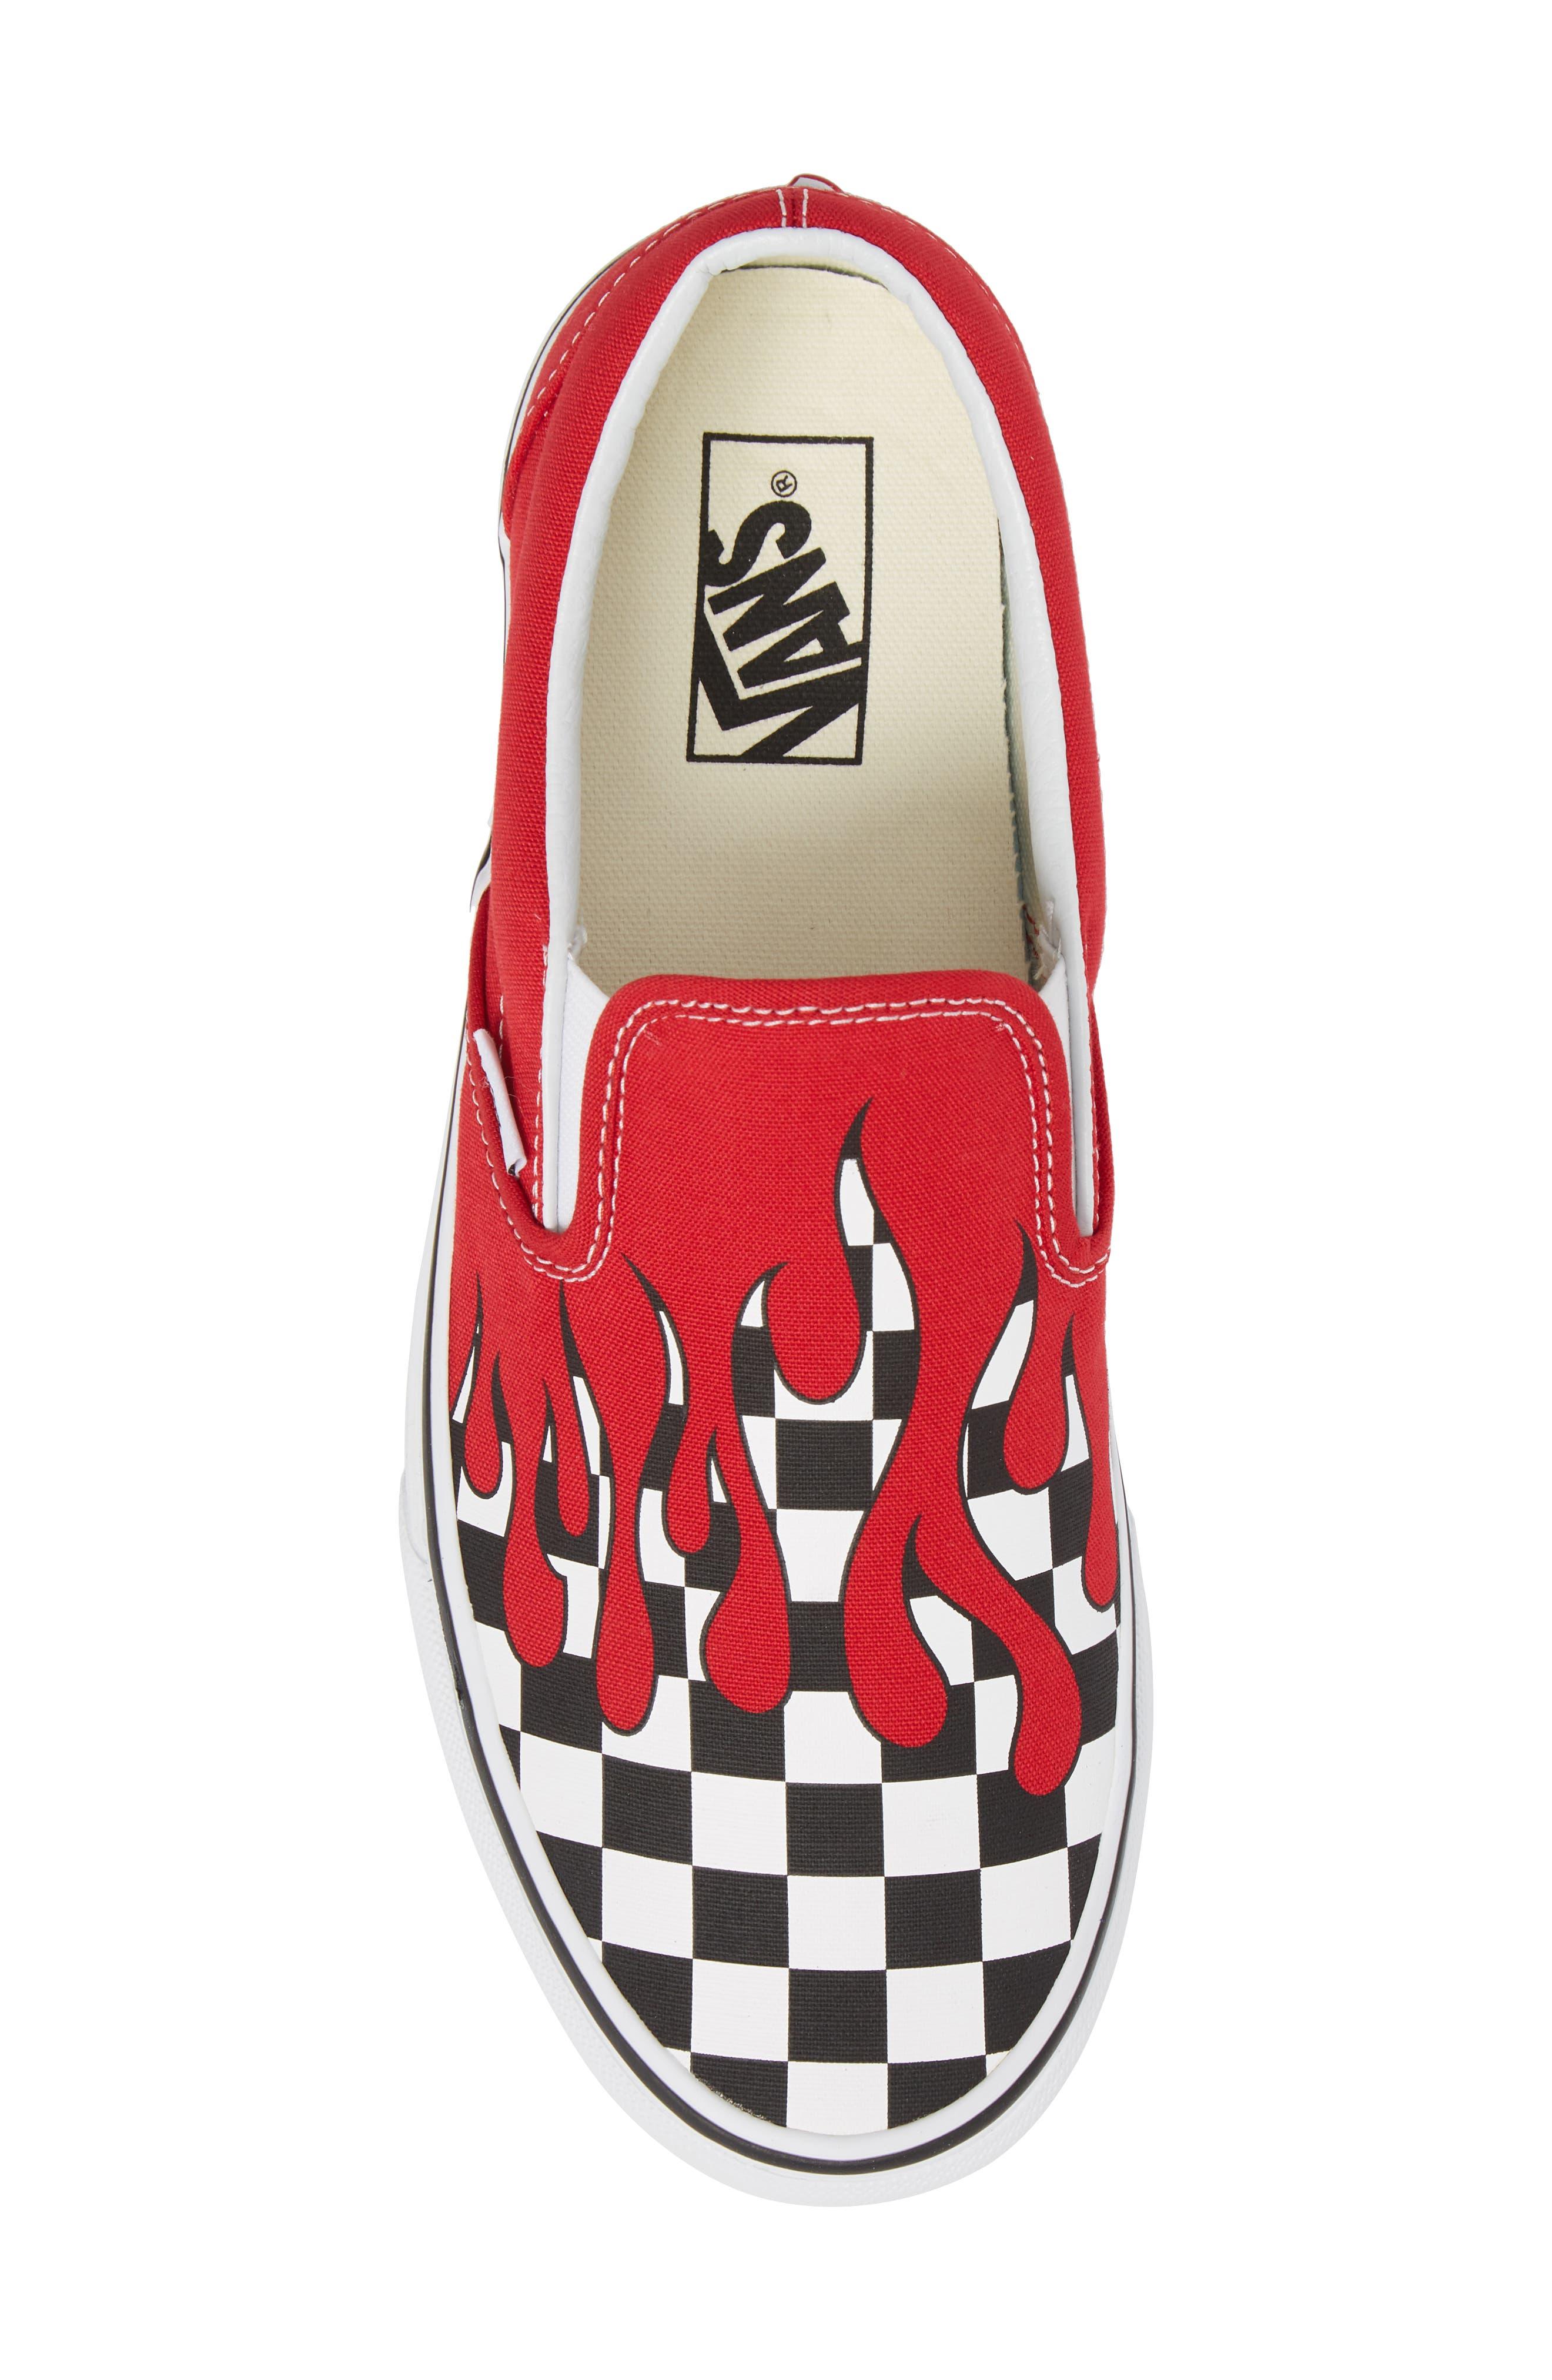 UA Classic Slip-On Sneaker,                             Alternate thumbnail 4, color,                             Racing Red/ White Checker